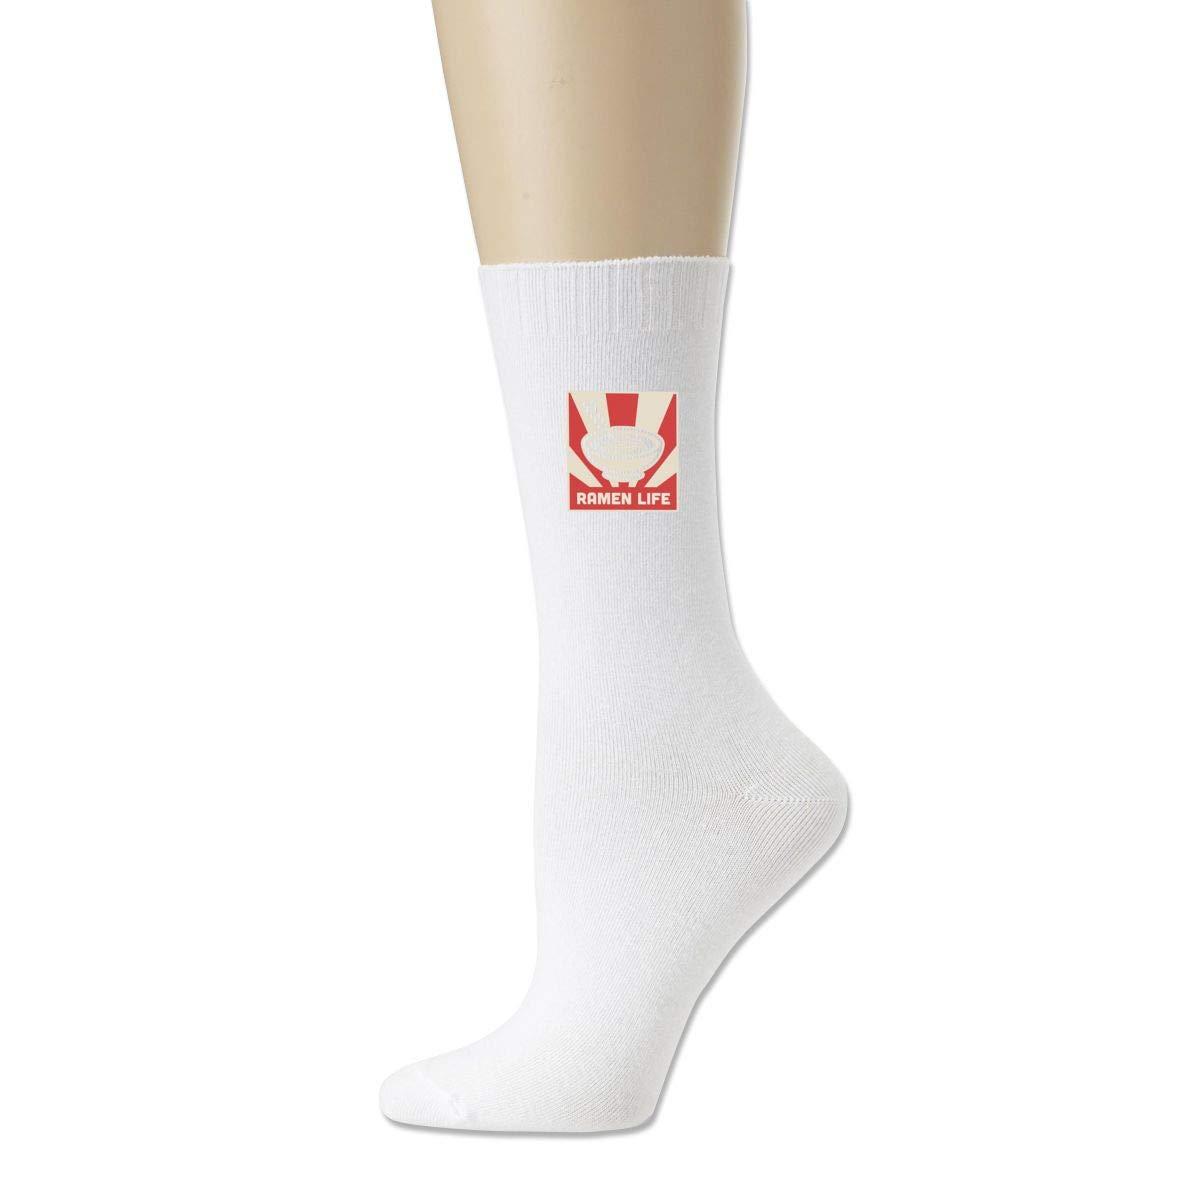 Retro Japanese RAMEN LIFE Cute Solid Socks For Socks